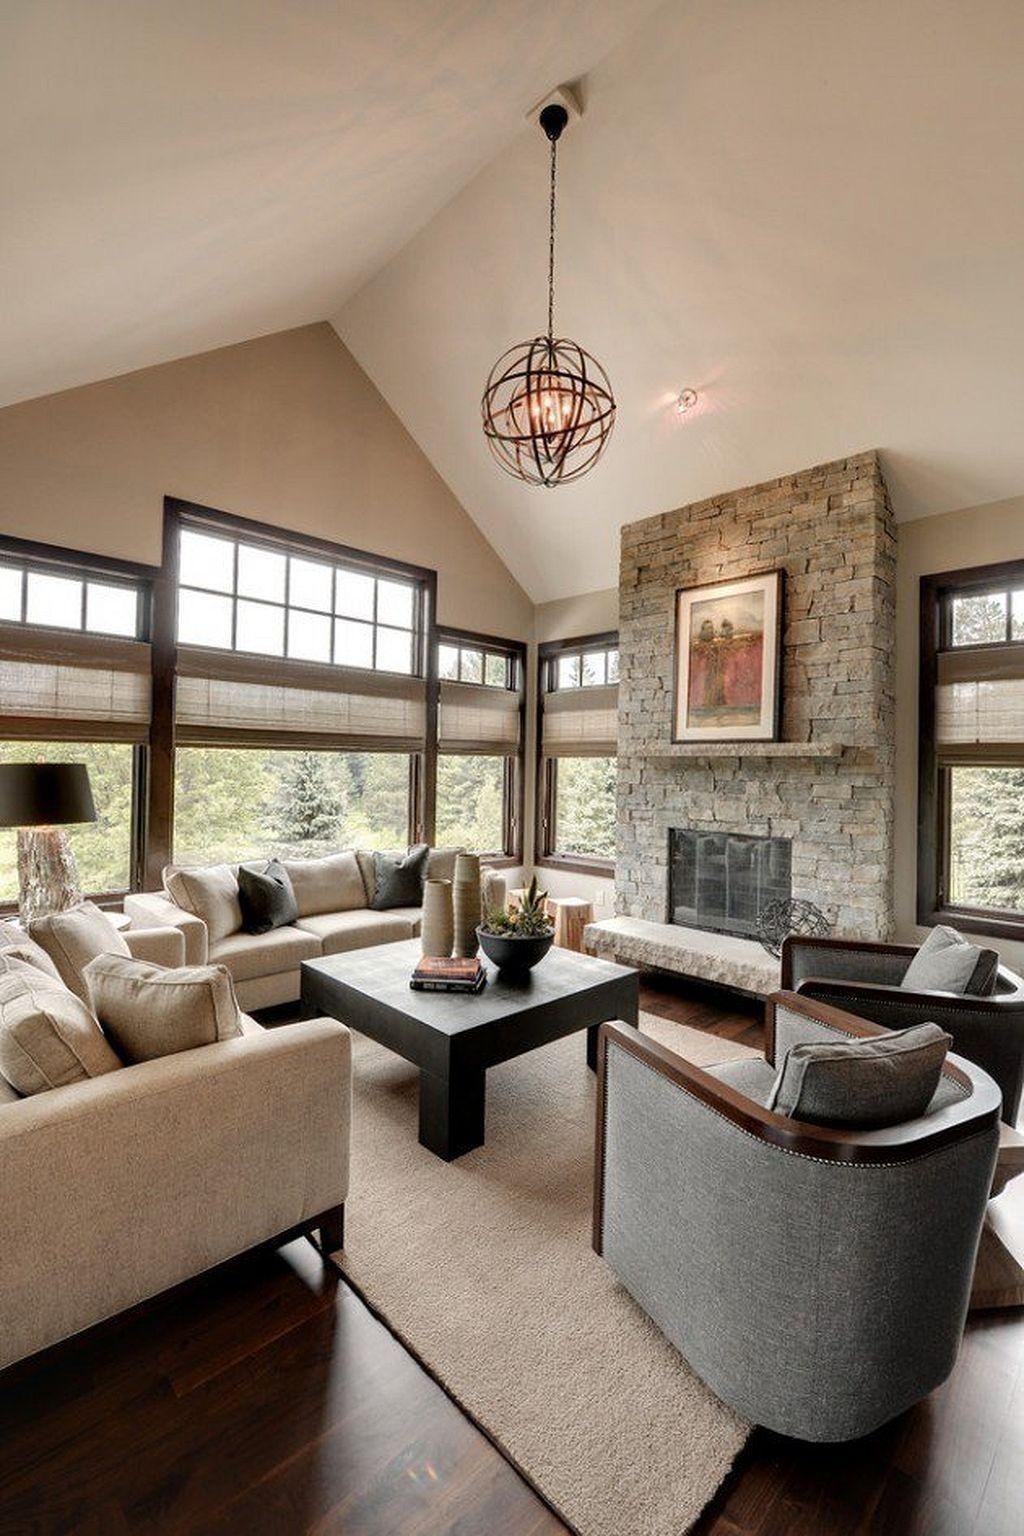 Fabulous Contemporary Family Room Decoration Ideas 05 home #remodelling #fabulous #contemporary #family #room #decoration #ideas #05